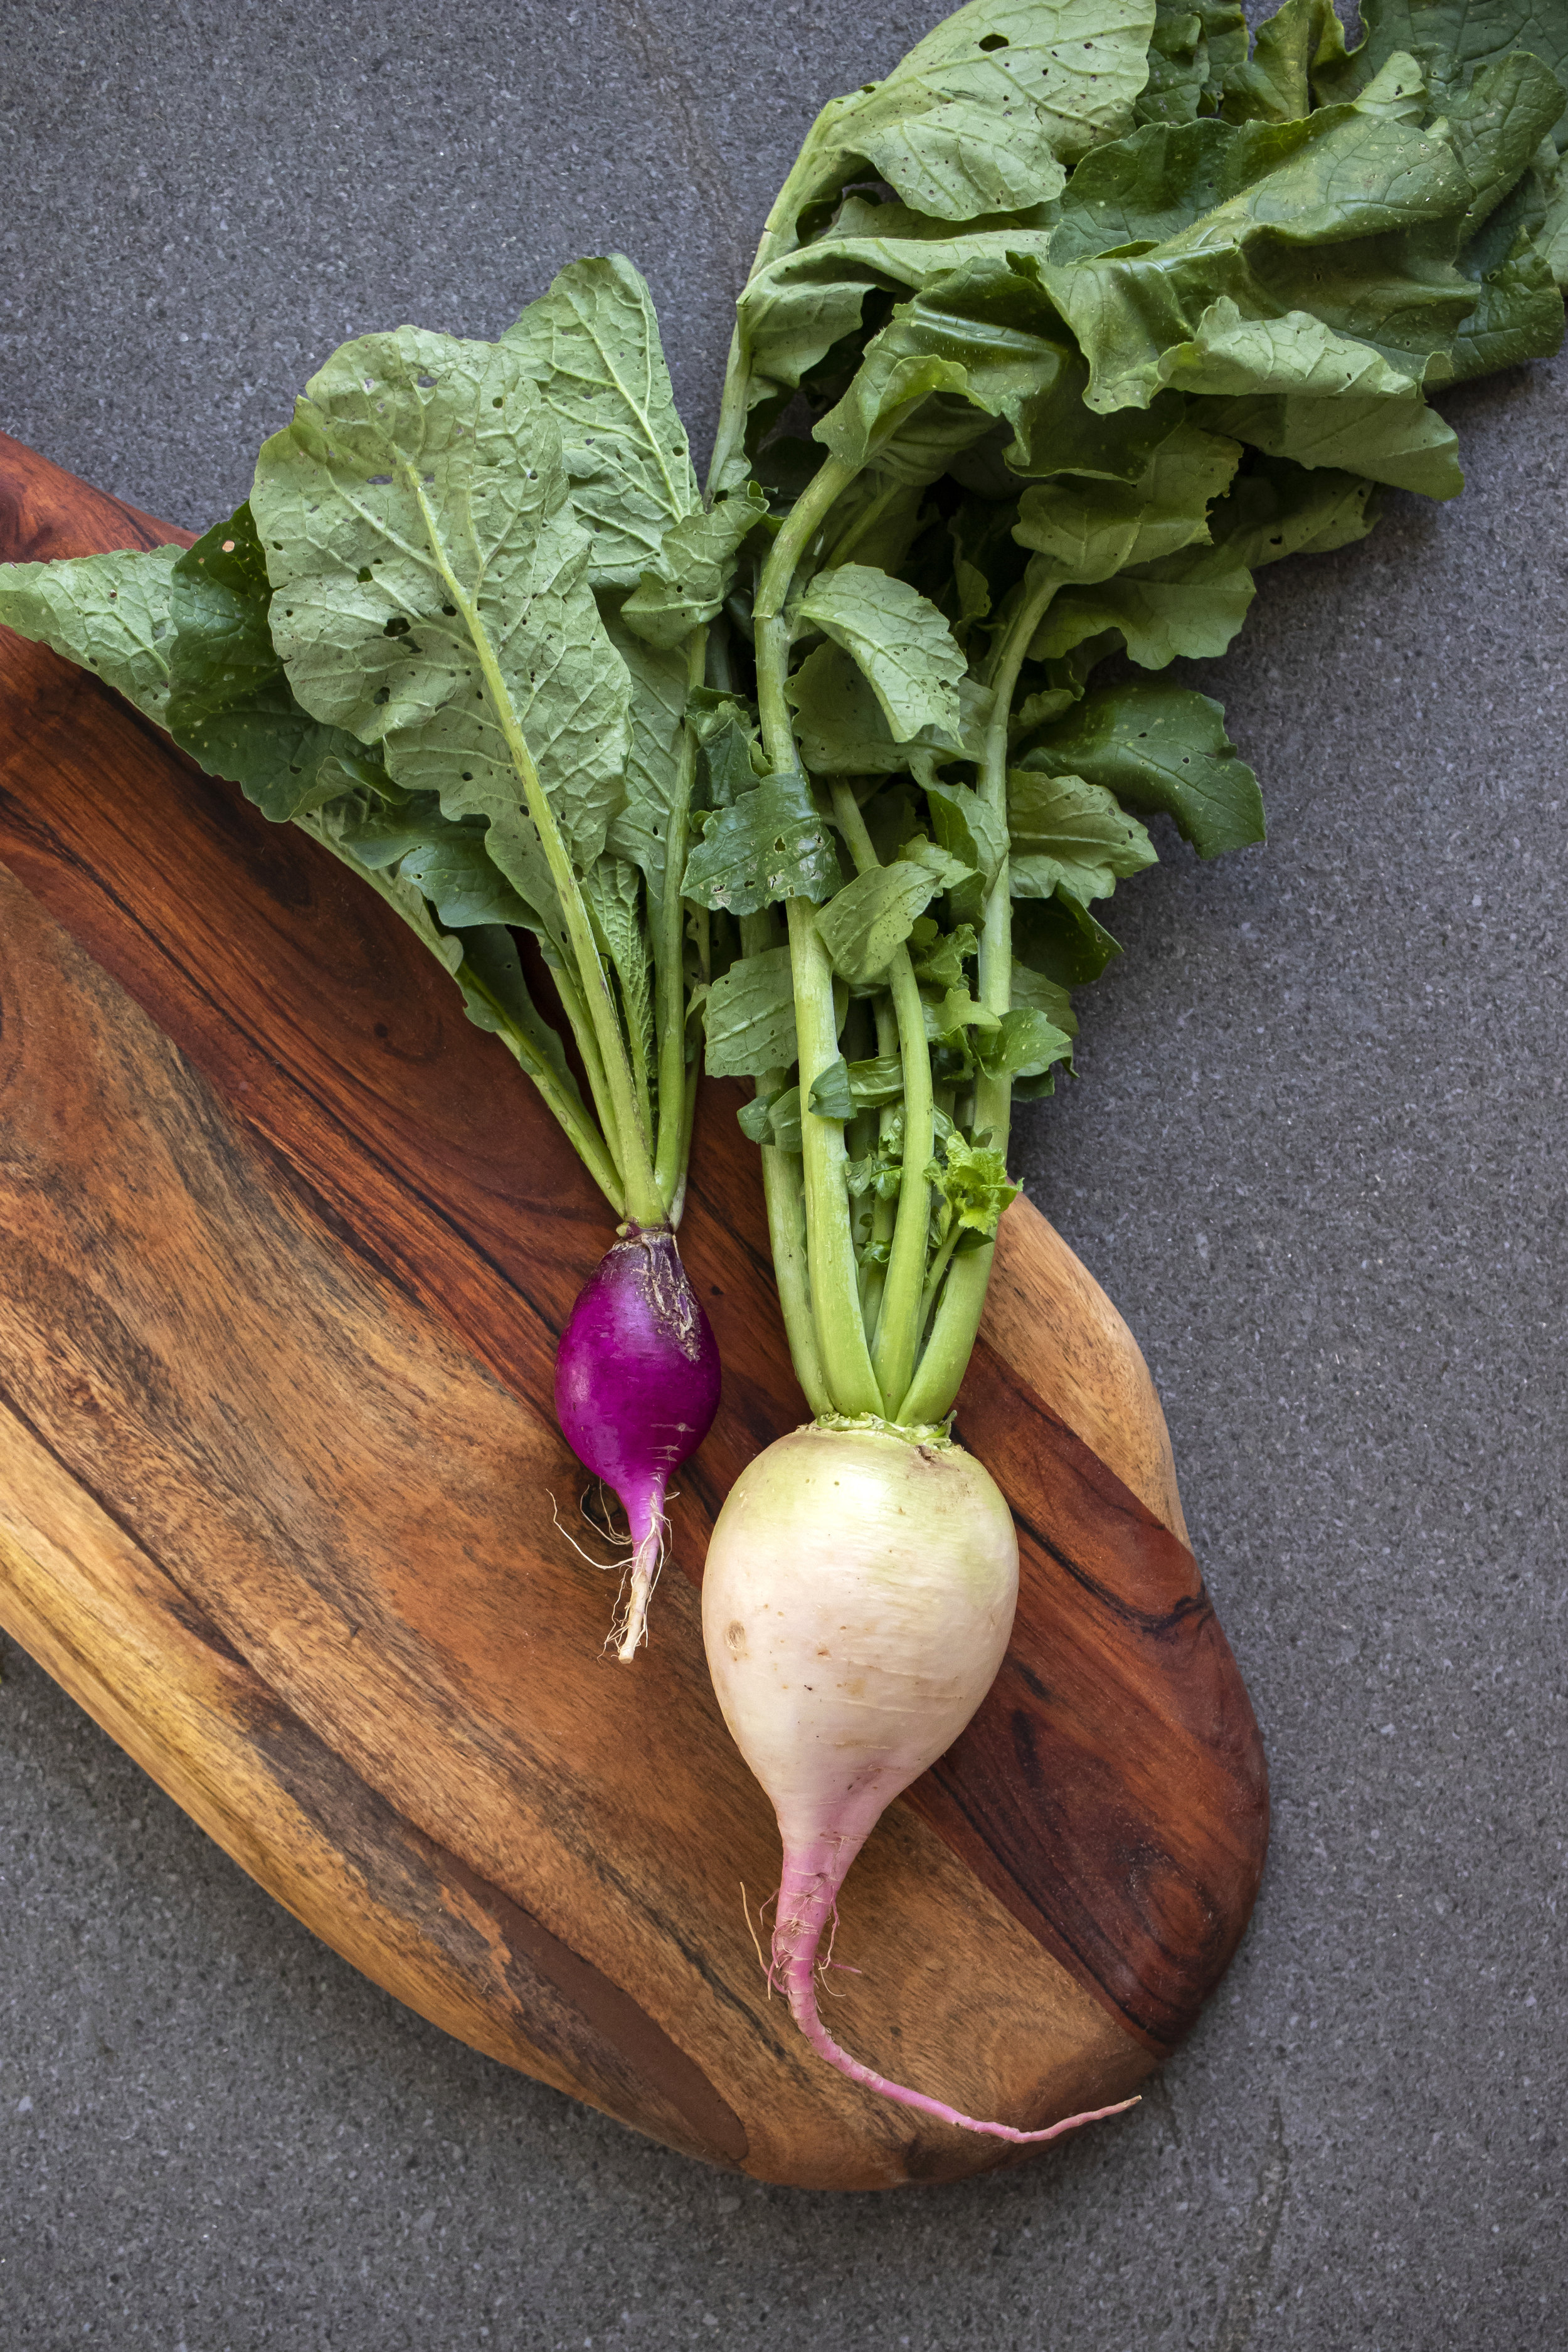 Gorman Farm Radishes | Cincinnati Food Photographer | Food Photographer | Allison McAdams.JPG